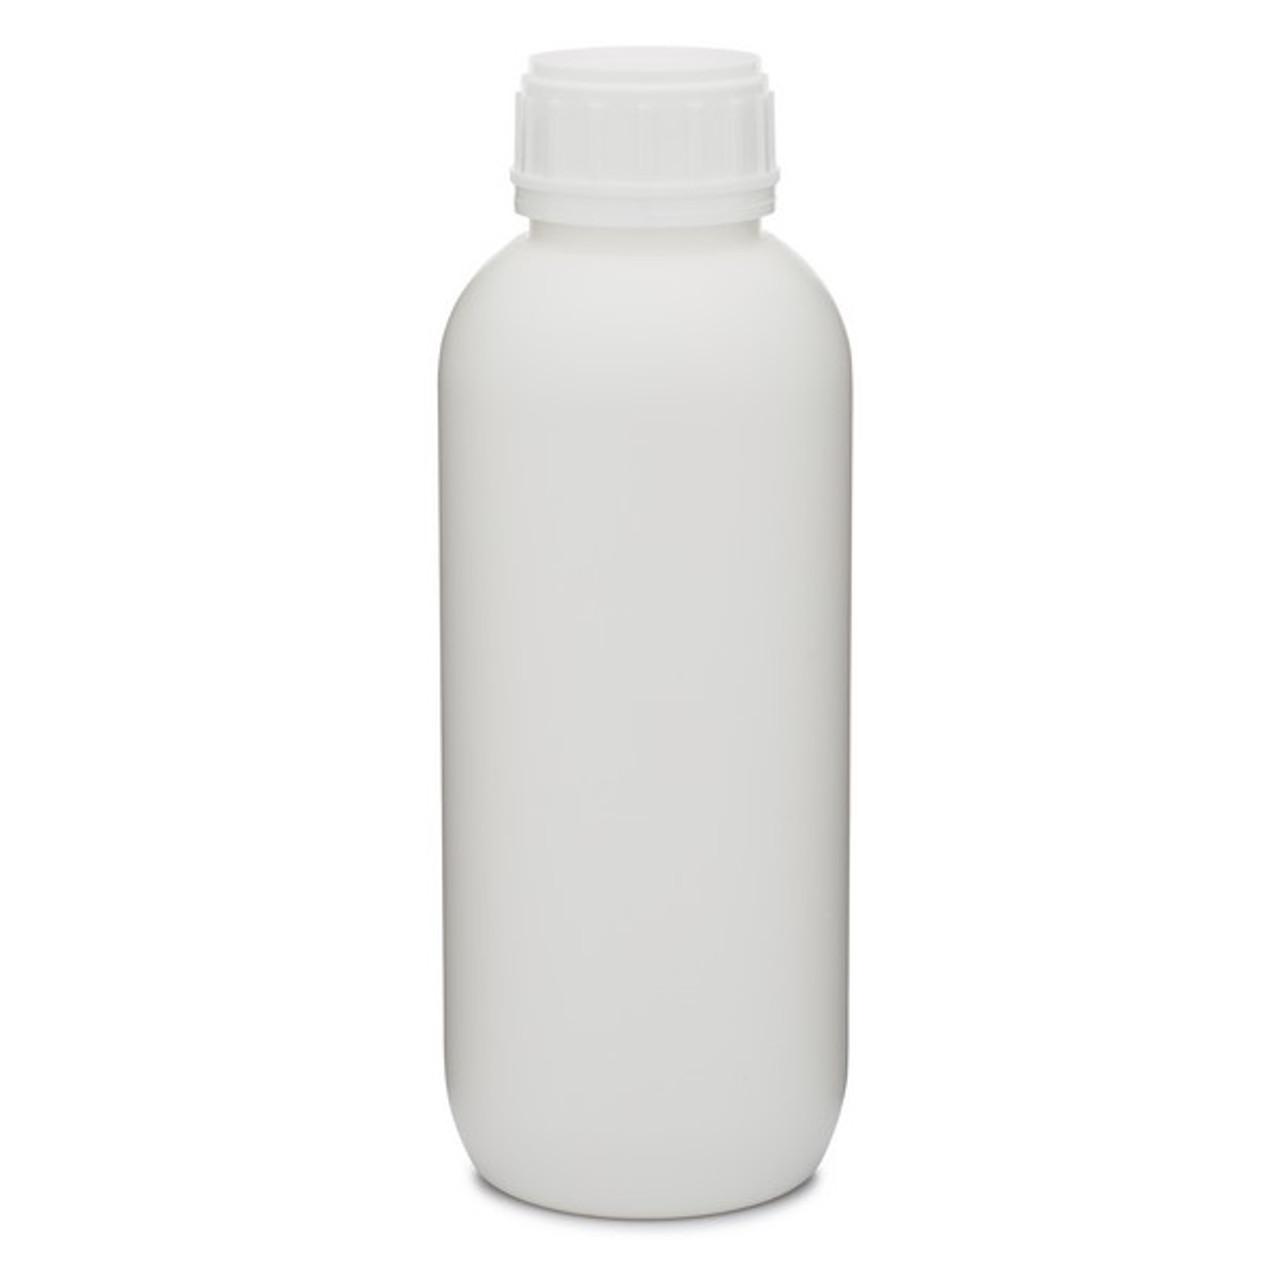 fb449ec4e8e2 Kautex 33.8 oz White PE-PA Plastic VarioPack Series AgroChemical CoEx  Barrier Round Leakproof Bottle - 1250B05